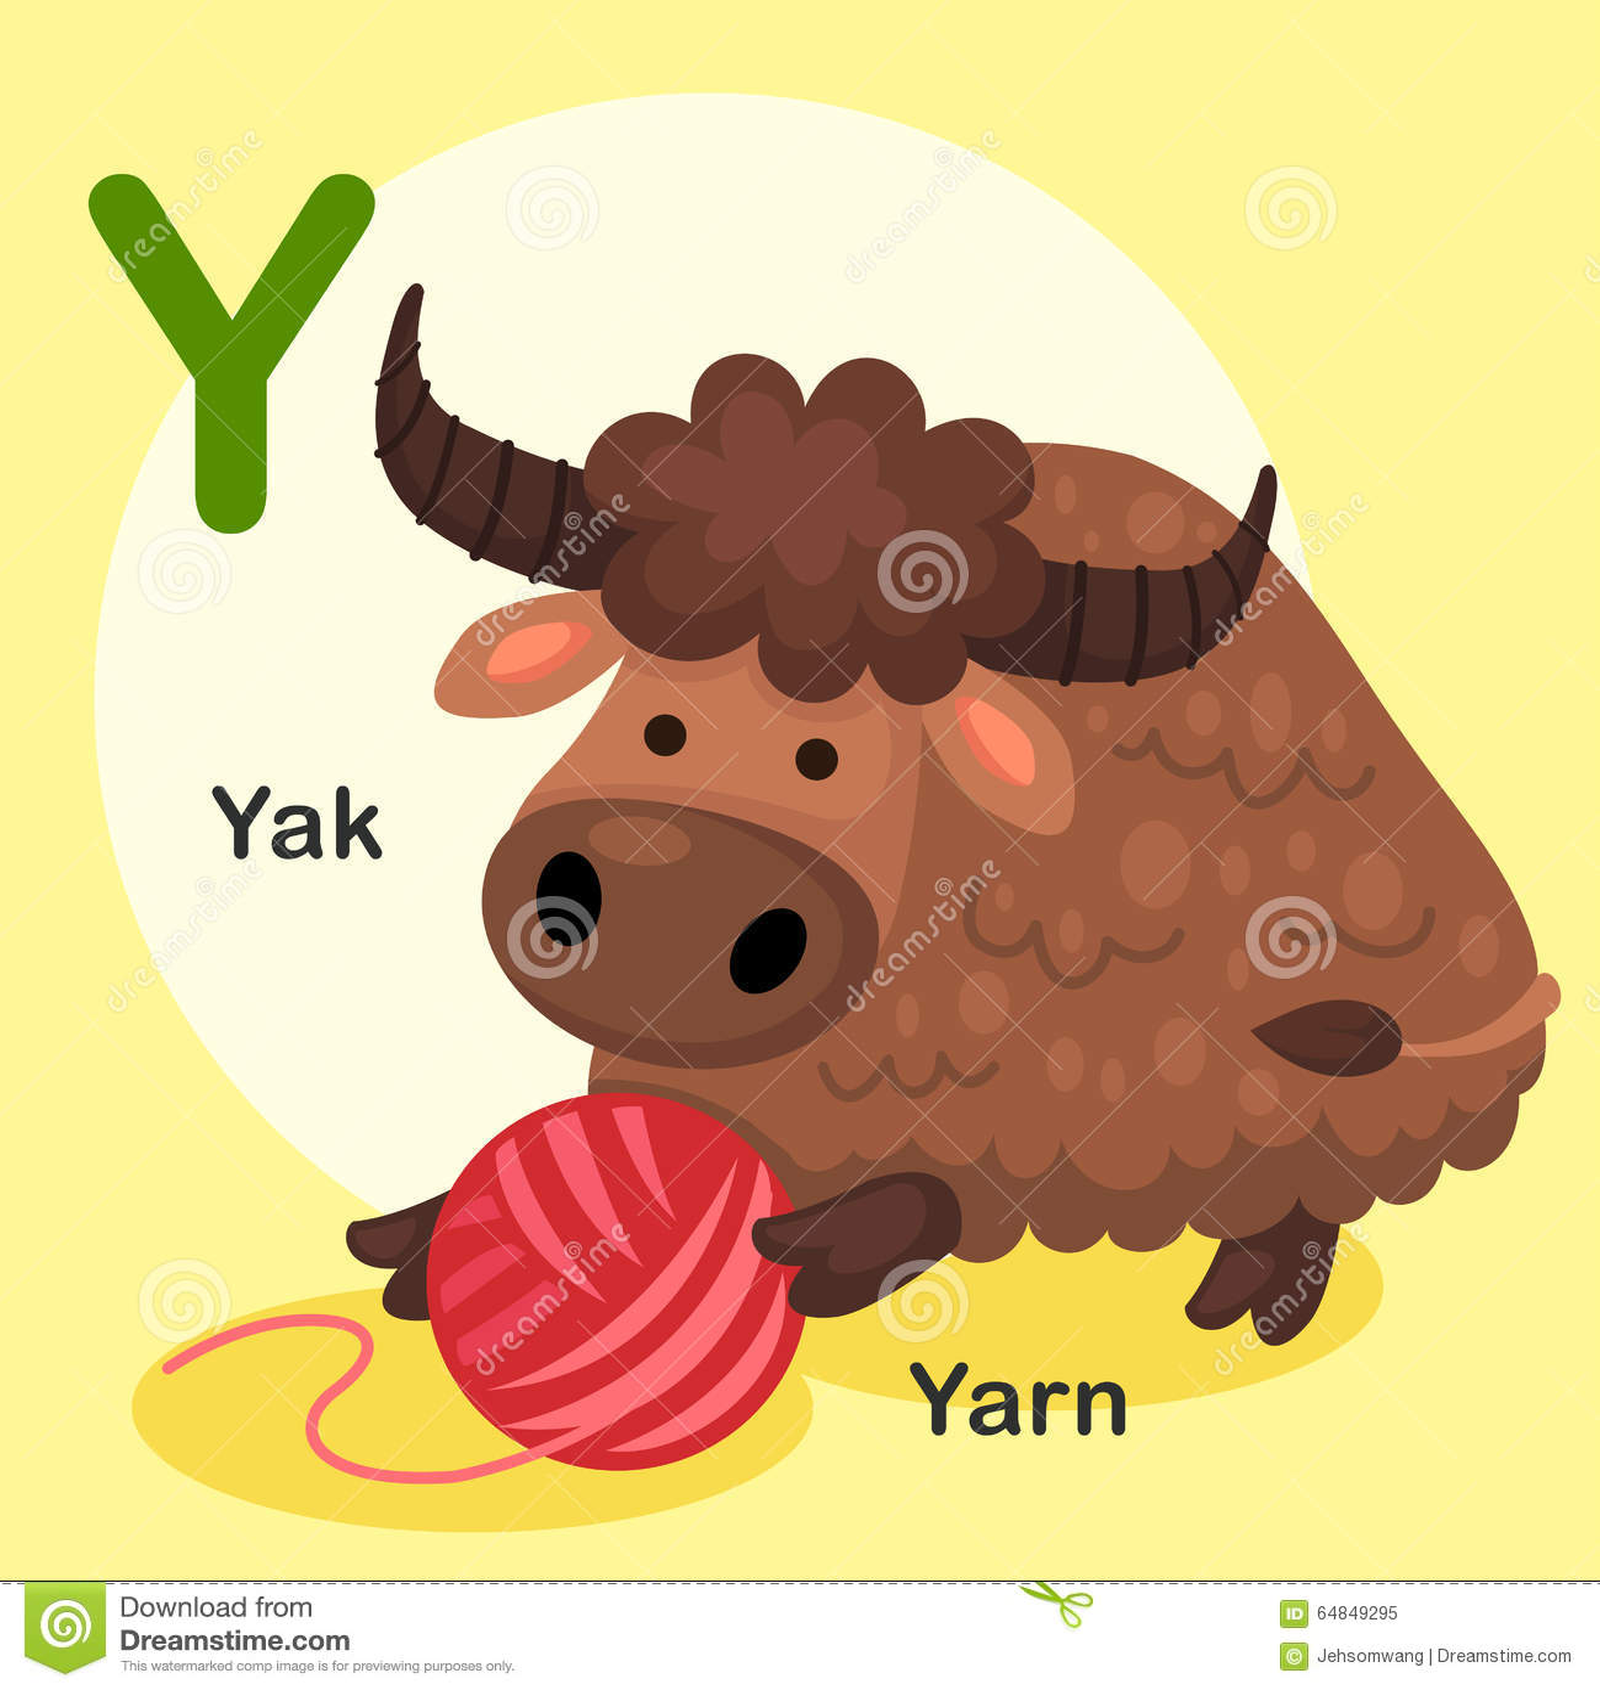 Illustration Animal Alphabet Letter Y Yak Yarn Stock Vector